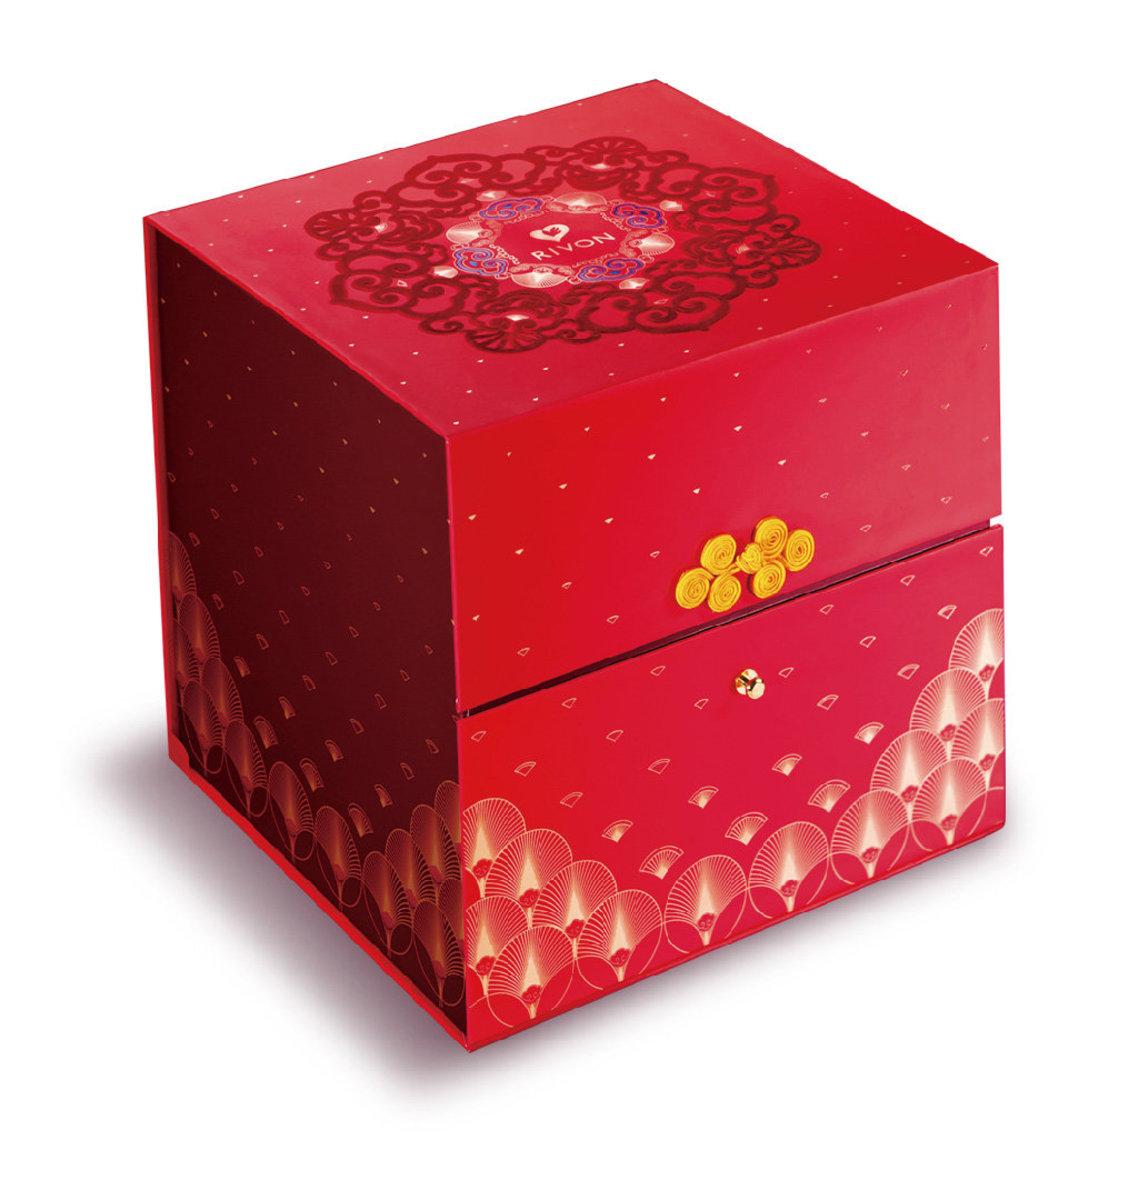 Rivon 禮坊 - 宮庭錦盒曲奇餅